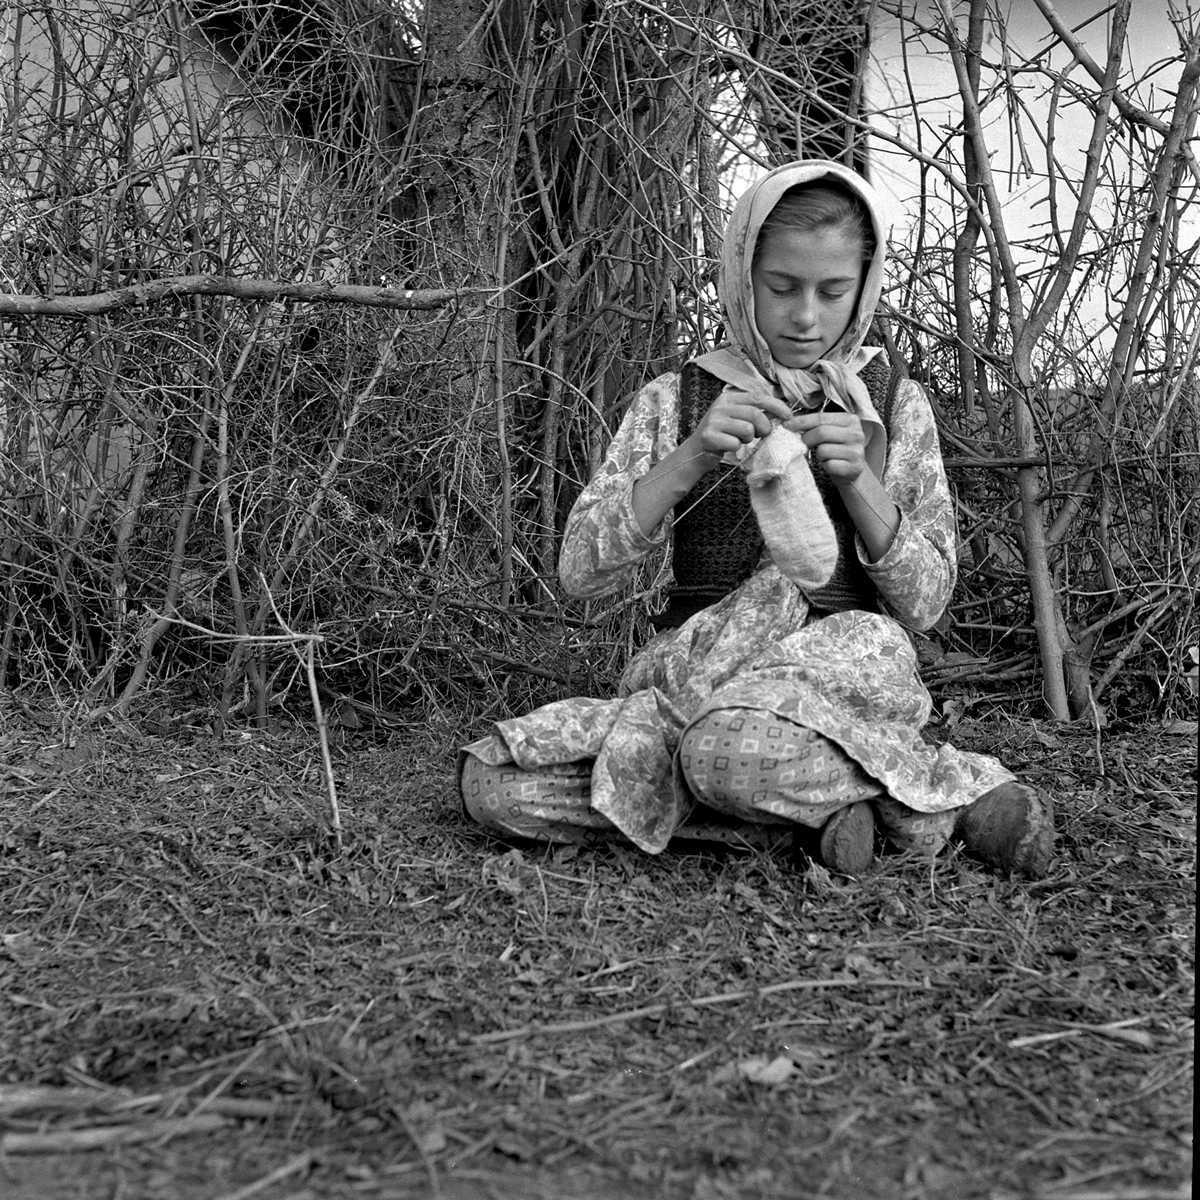 Village Girl, Doganca 1963